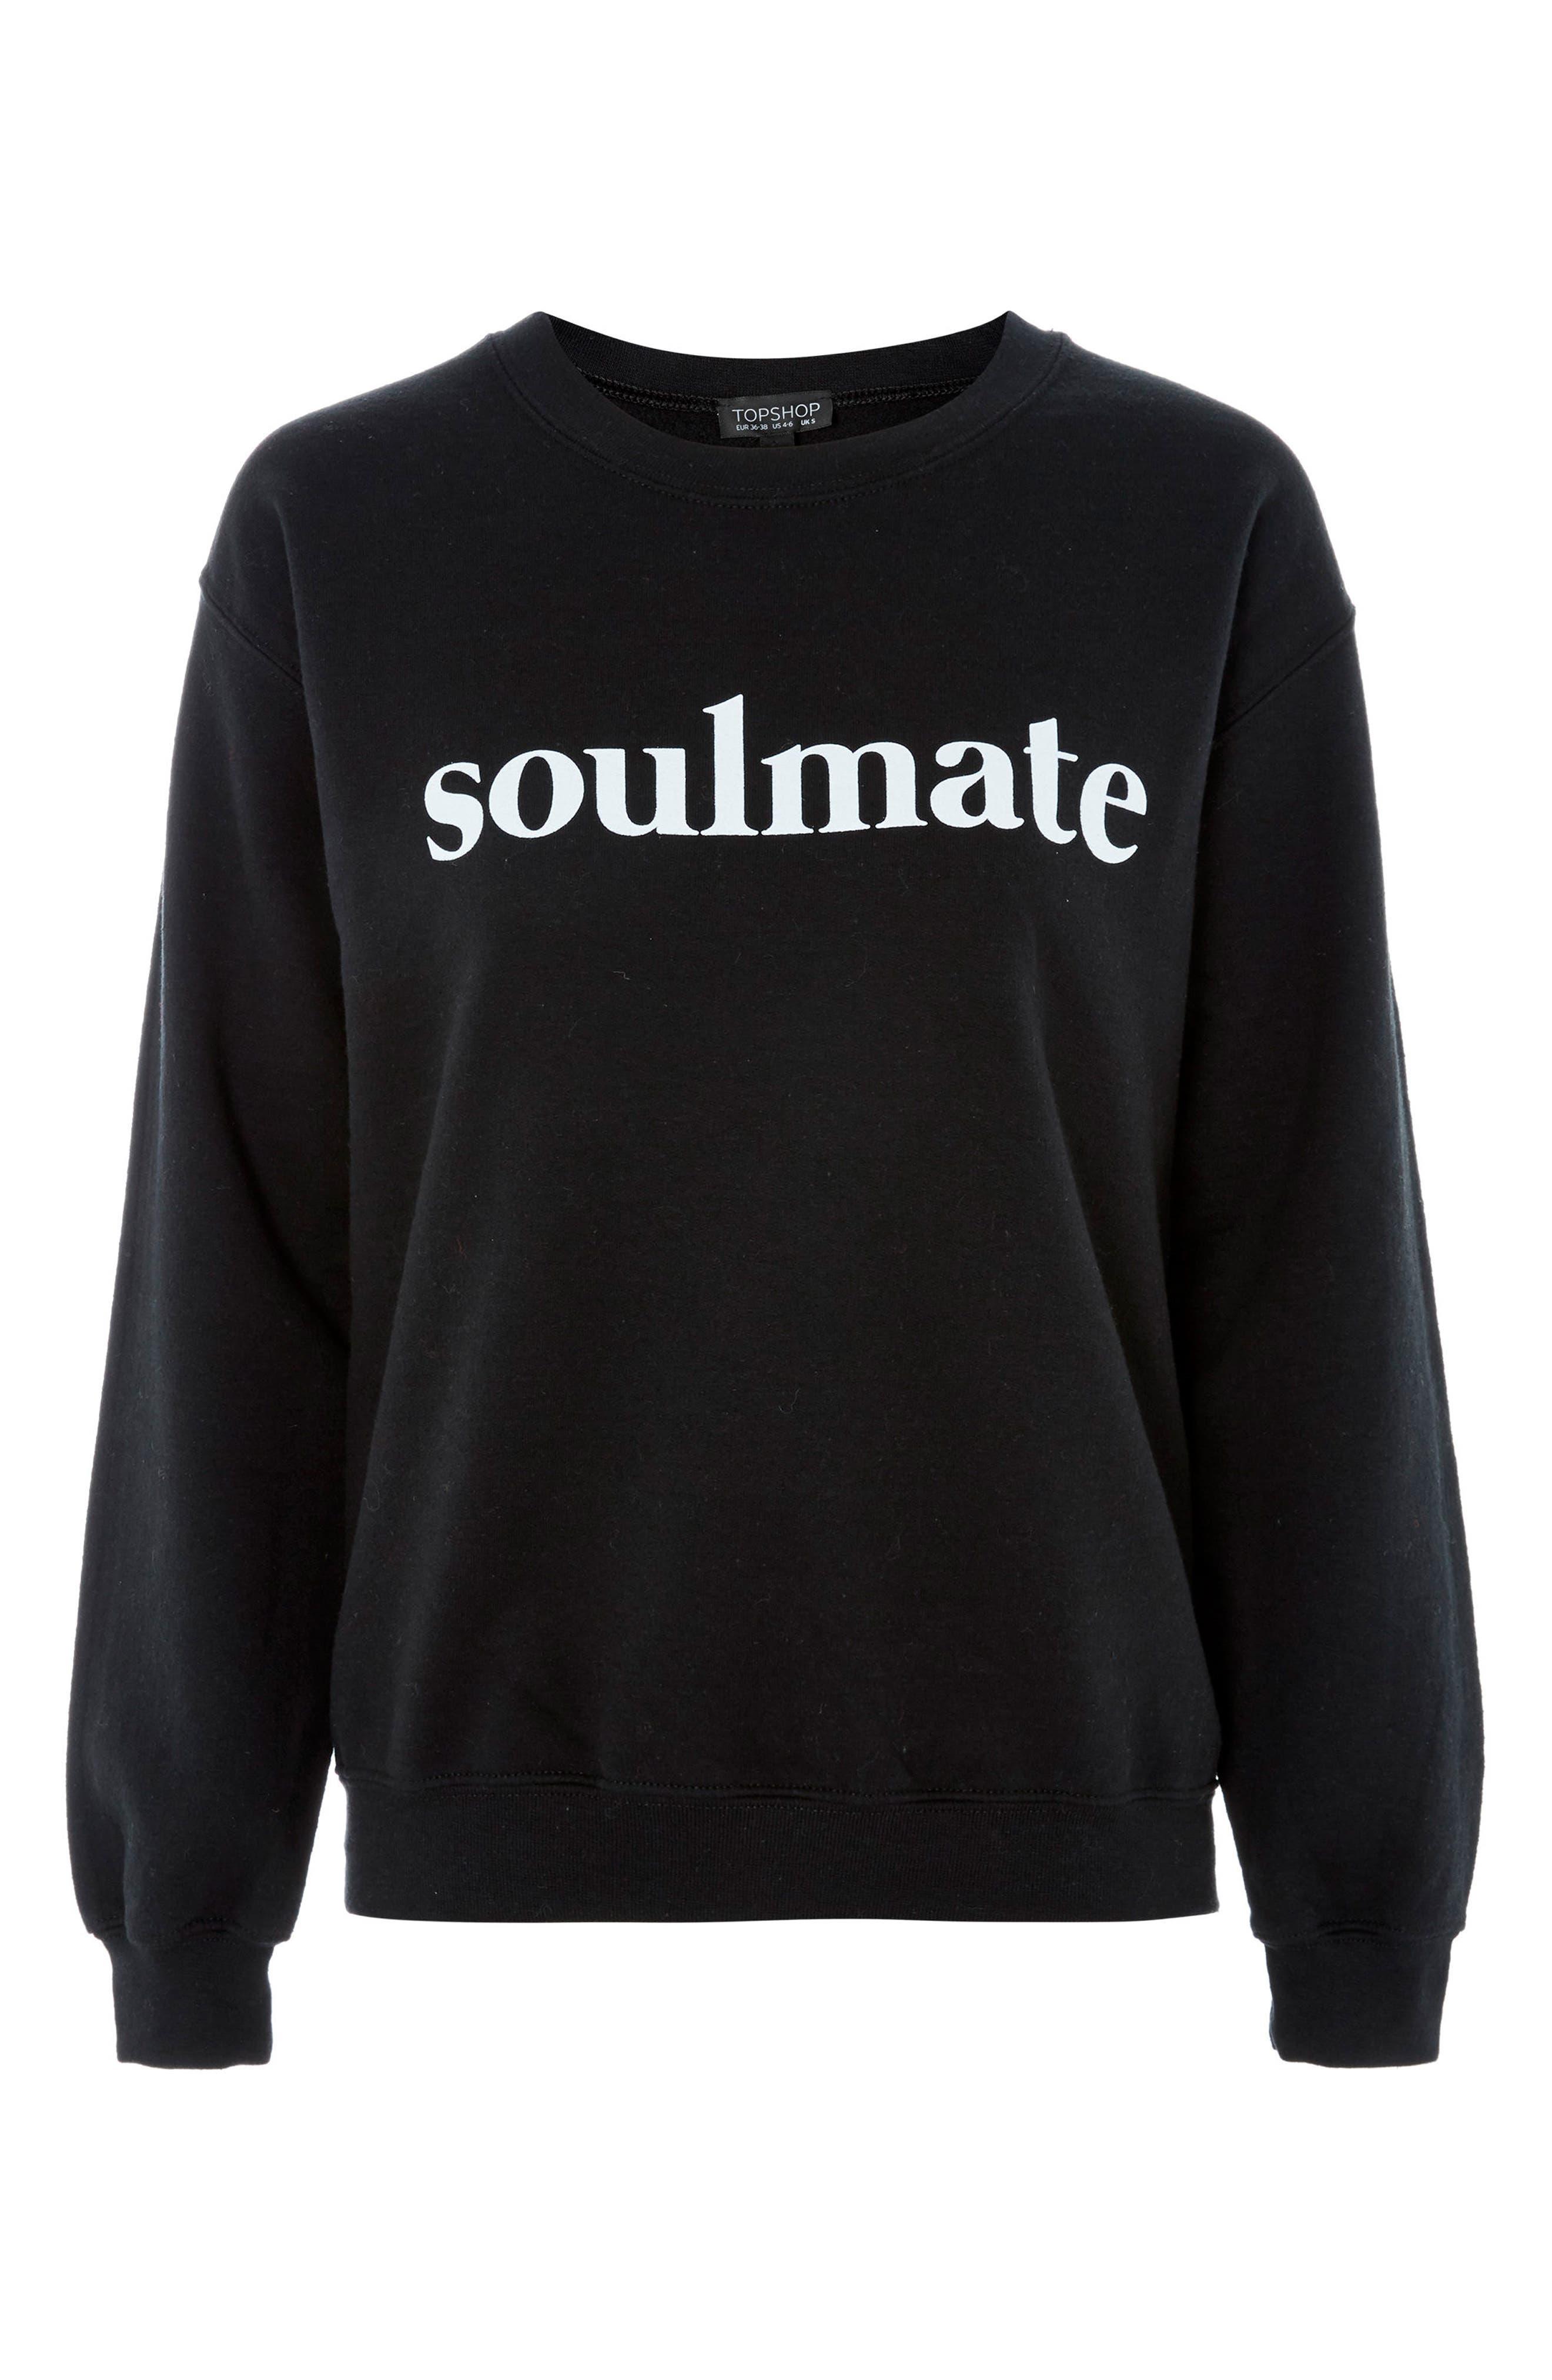 Soulmate Graphic Sweatshirt,                             Alternate thumbnail 3, color,                             001